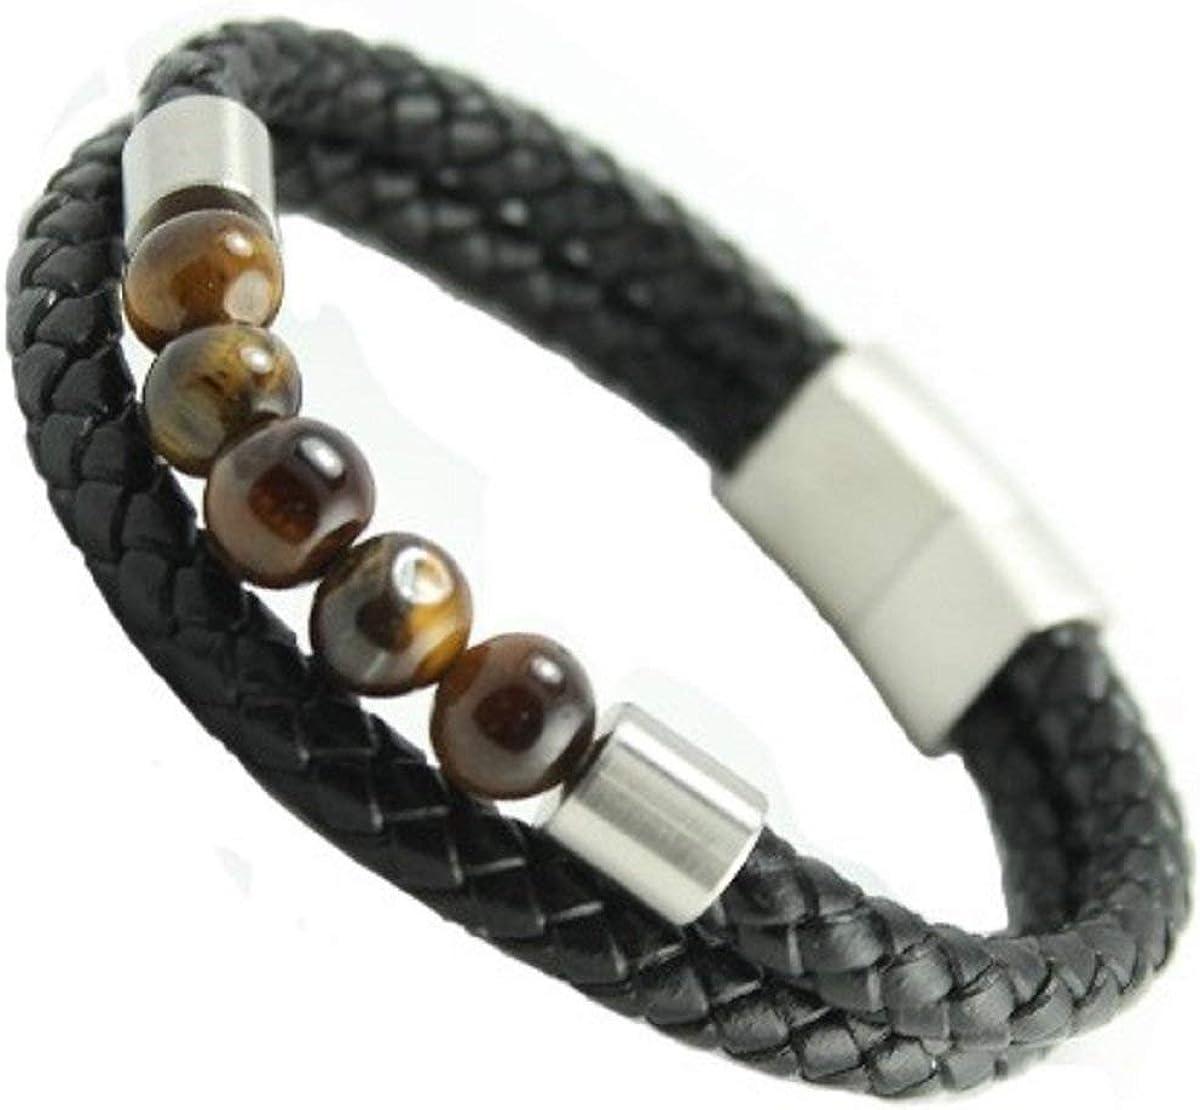 LND Black Branded goods service Multi String Braided Stainless Bracele Steel Leather